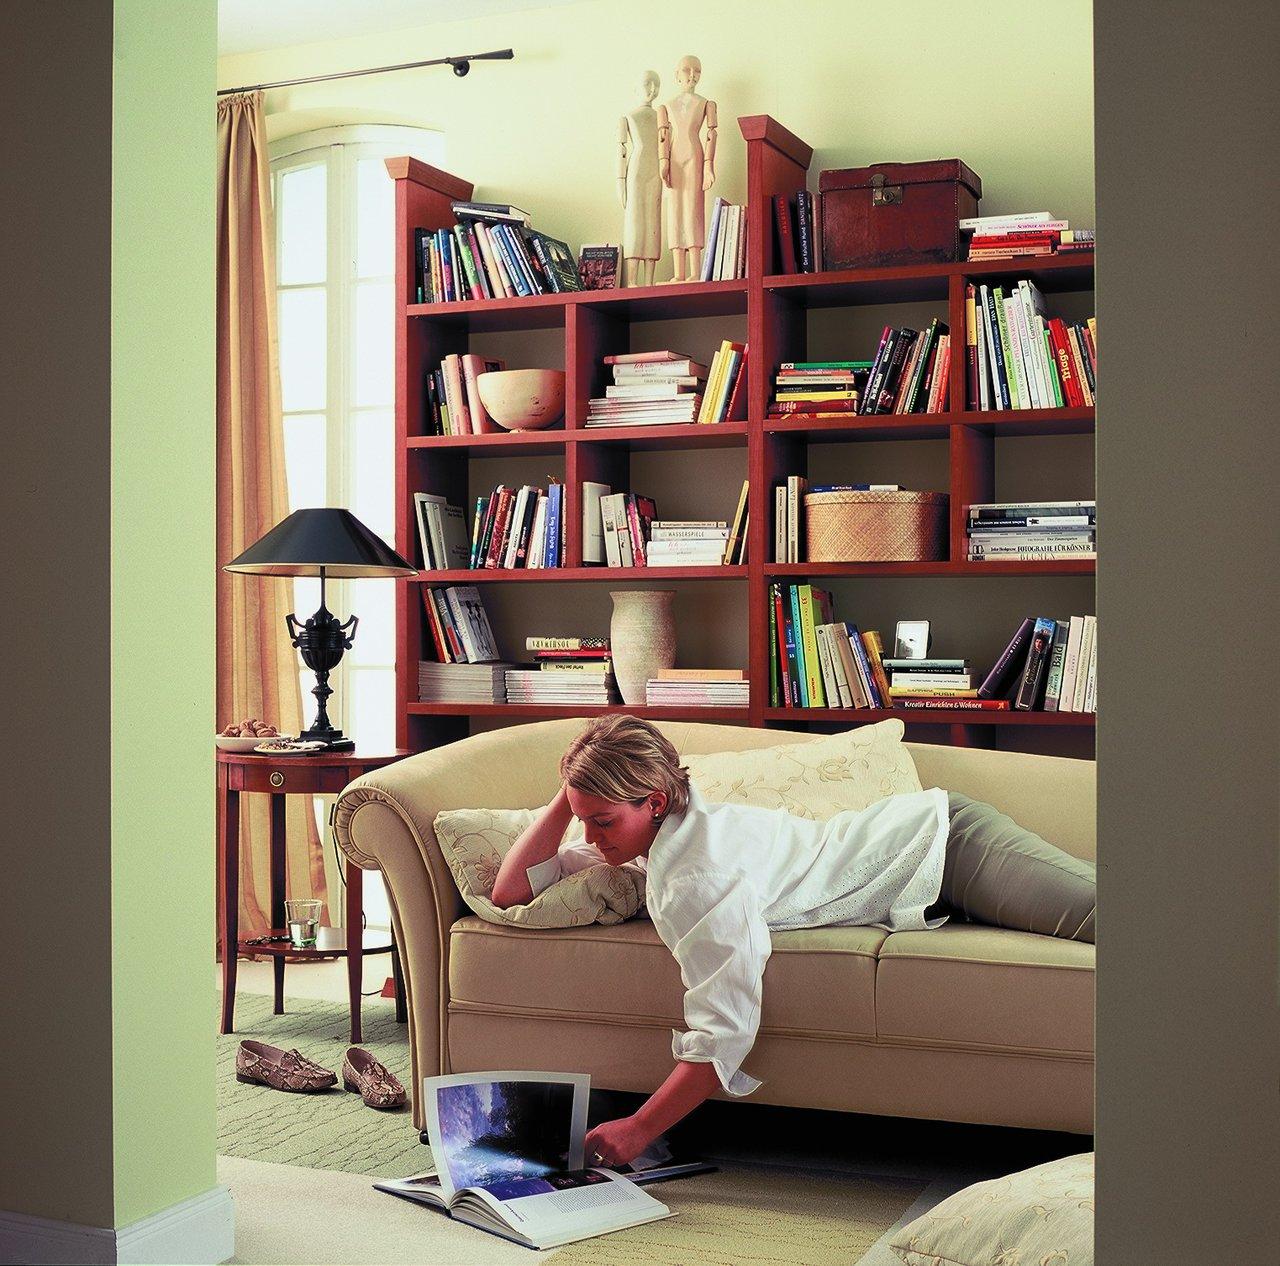 teppichboden bri ko verlegeservice und naturbrennstoffe. Black Bedroom Furniture Sets. Home Design Ideas